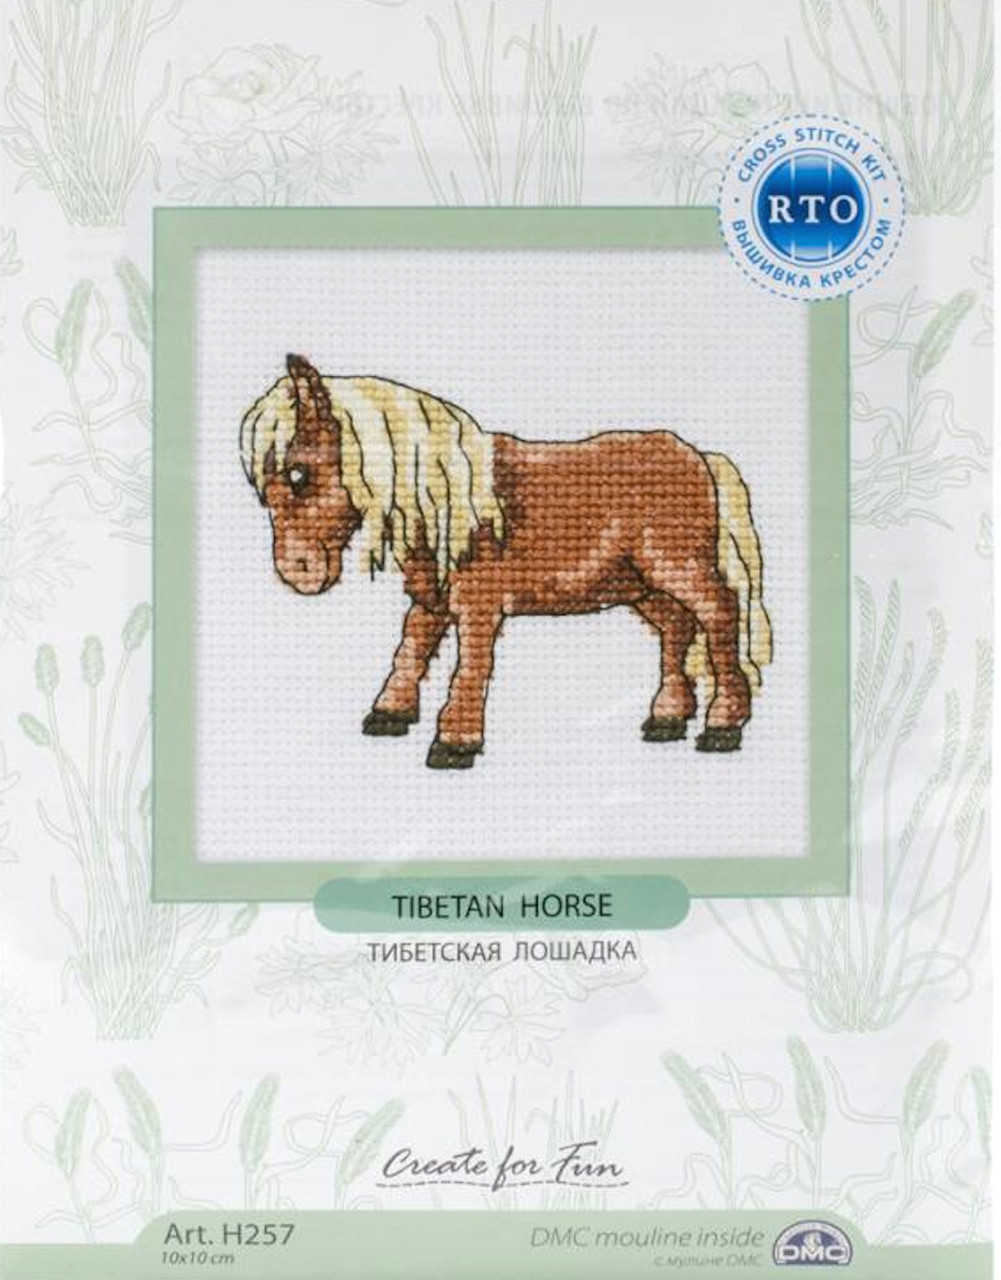 RTO - Tibetan Horse